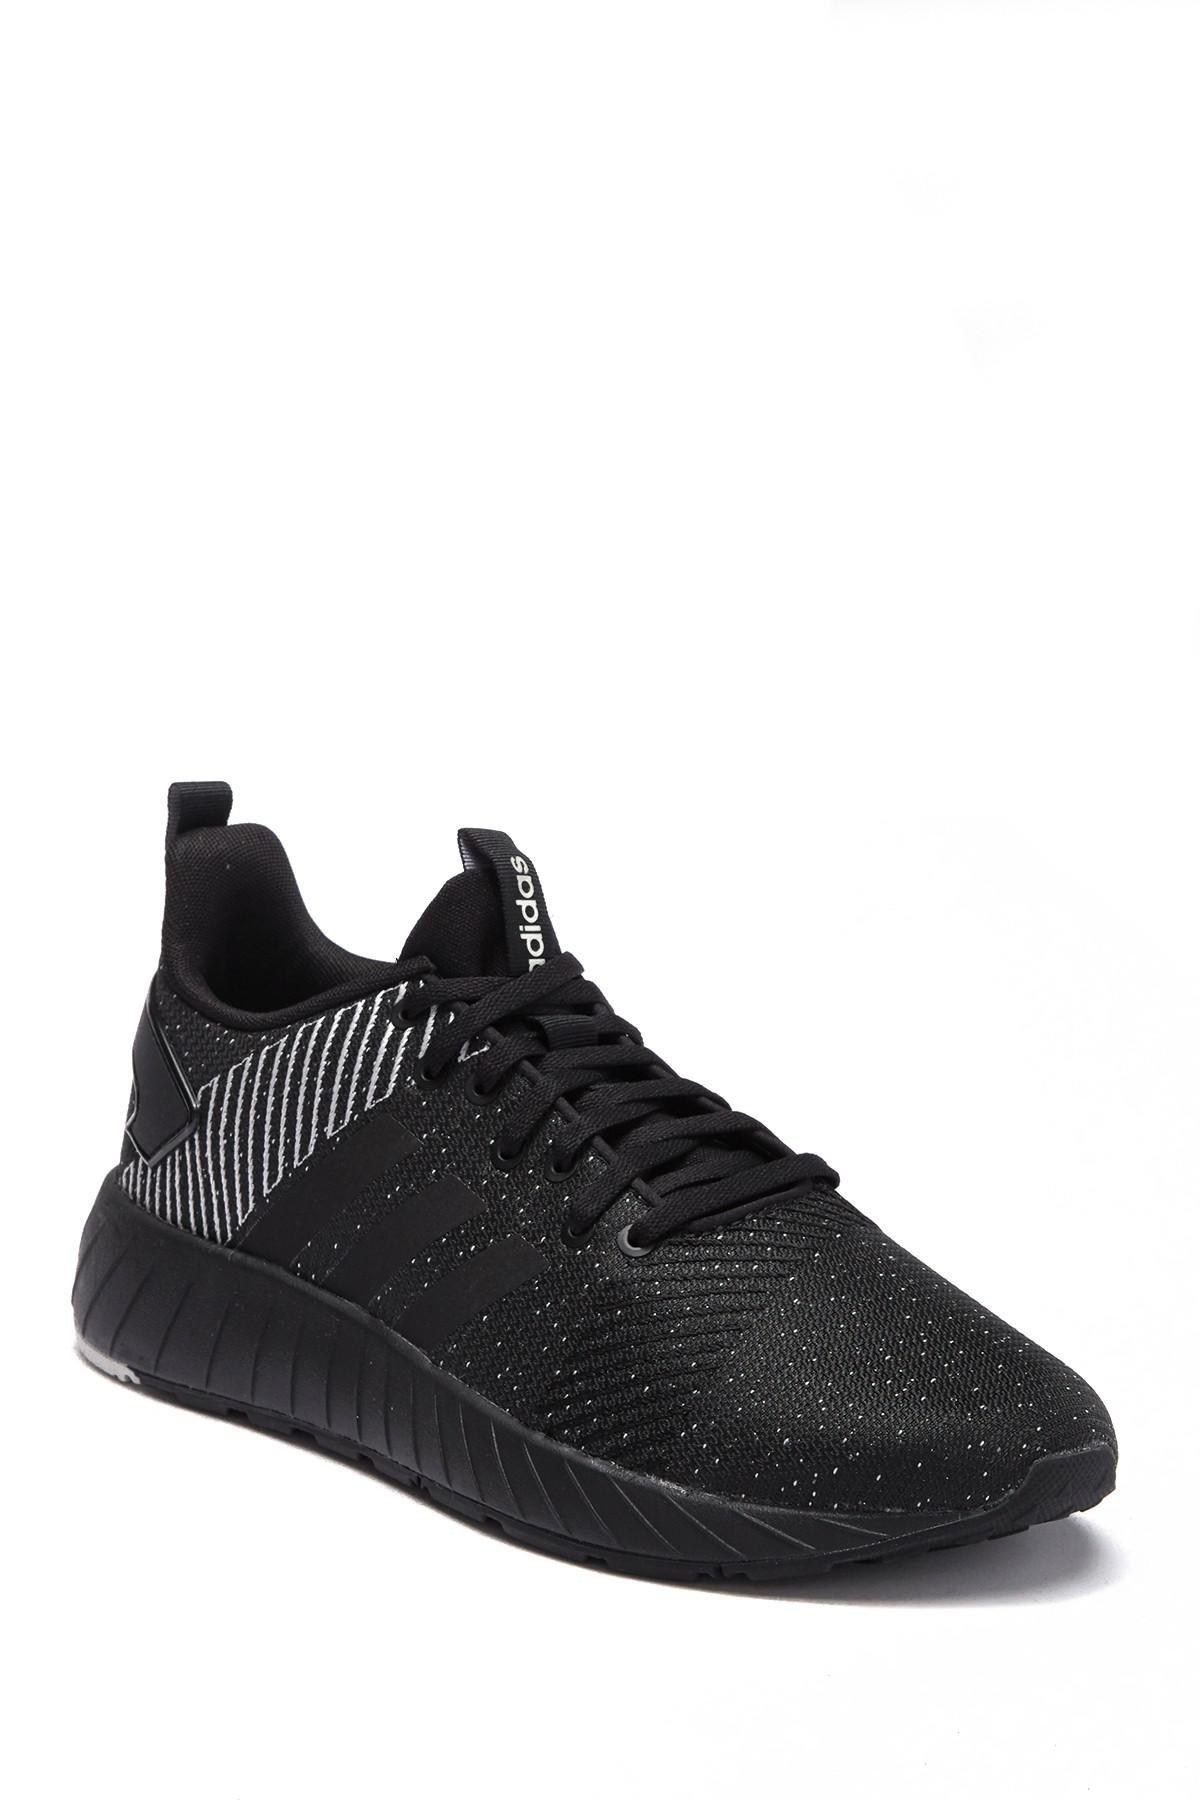 Lyst - adidas Questar Byd Sneaker in Black for Men d109499df